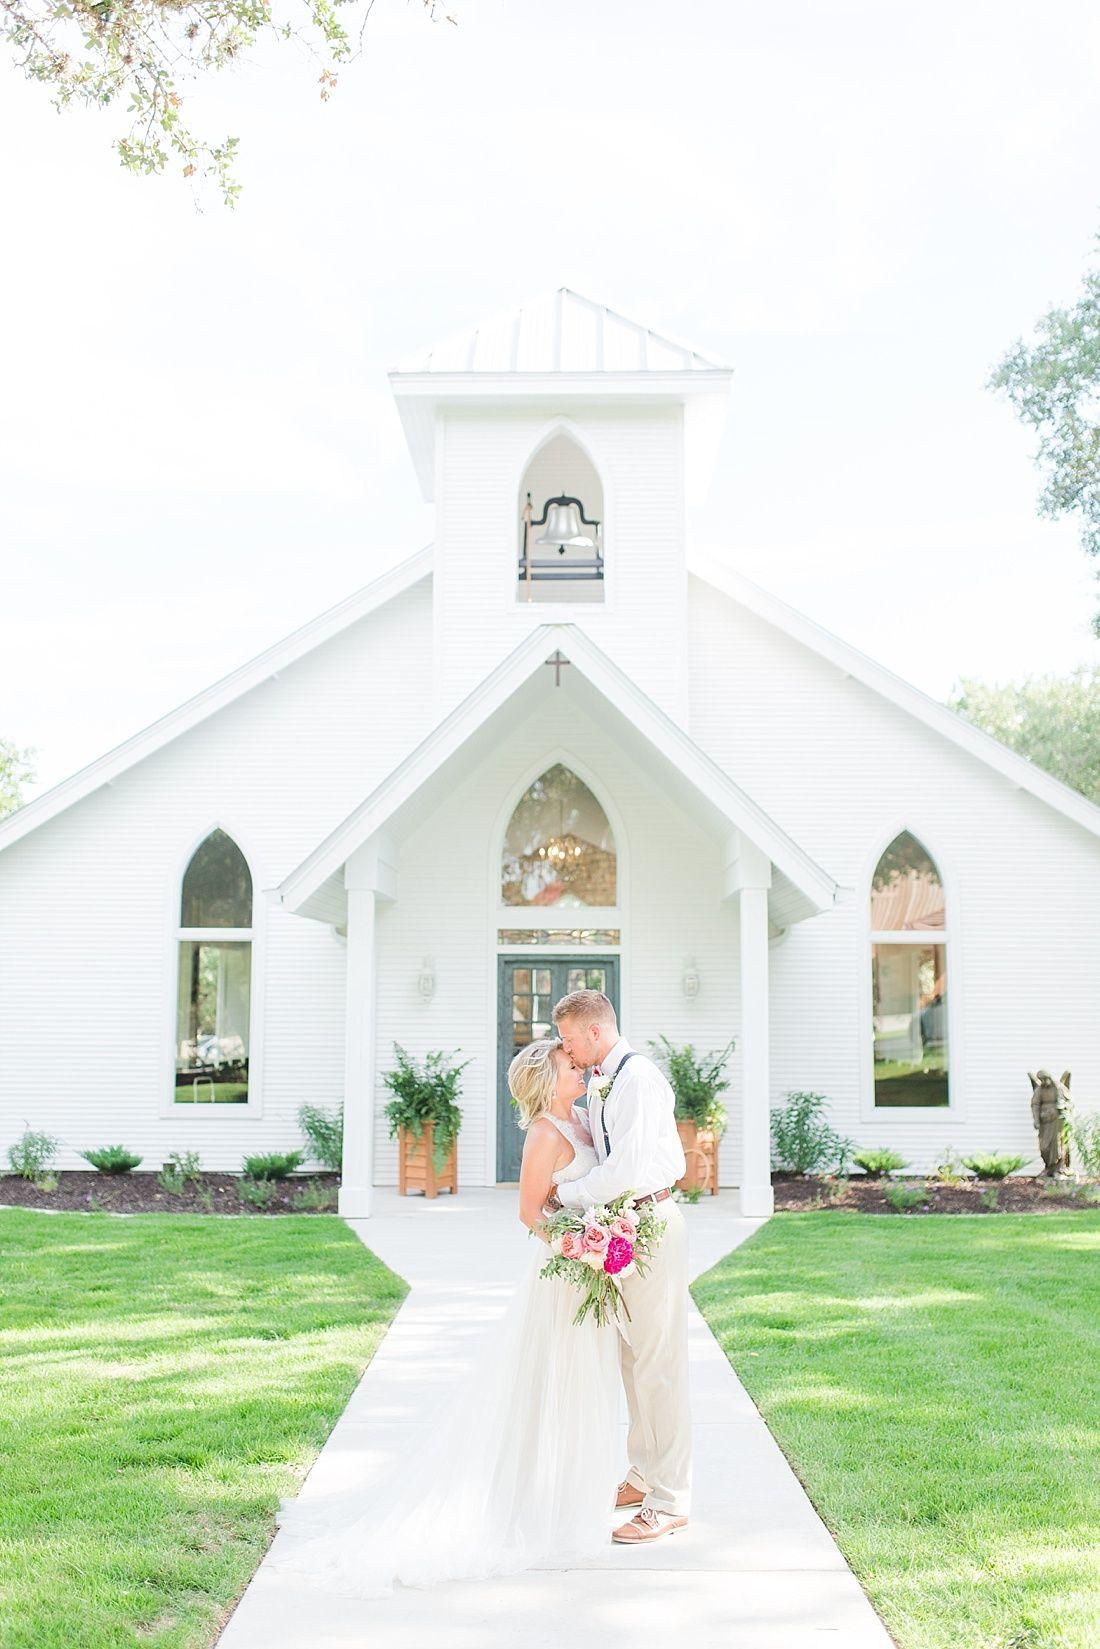 The Chandelier of Gruene Wedding Venue New Braunfels Texas